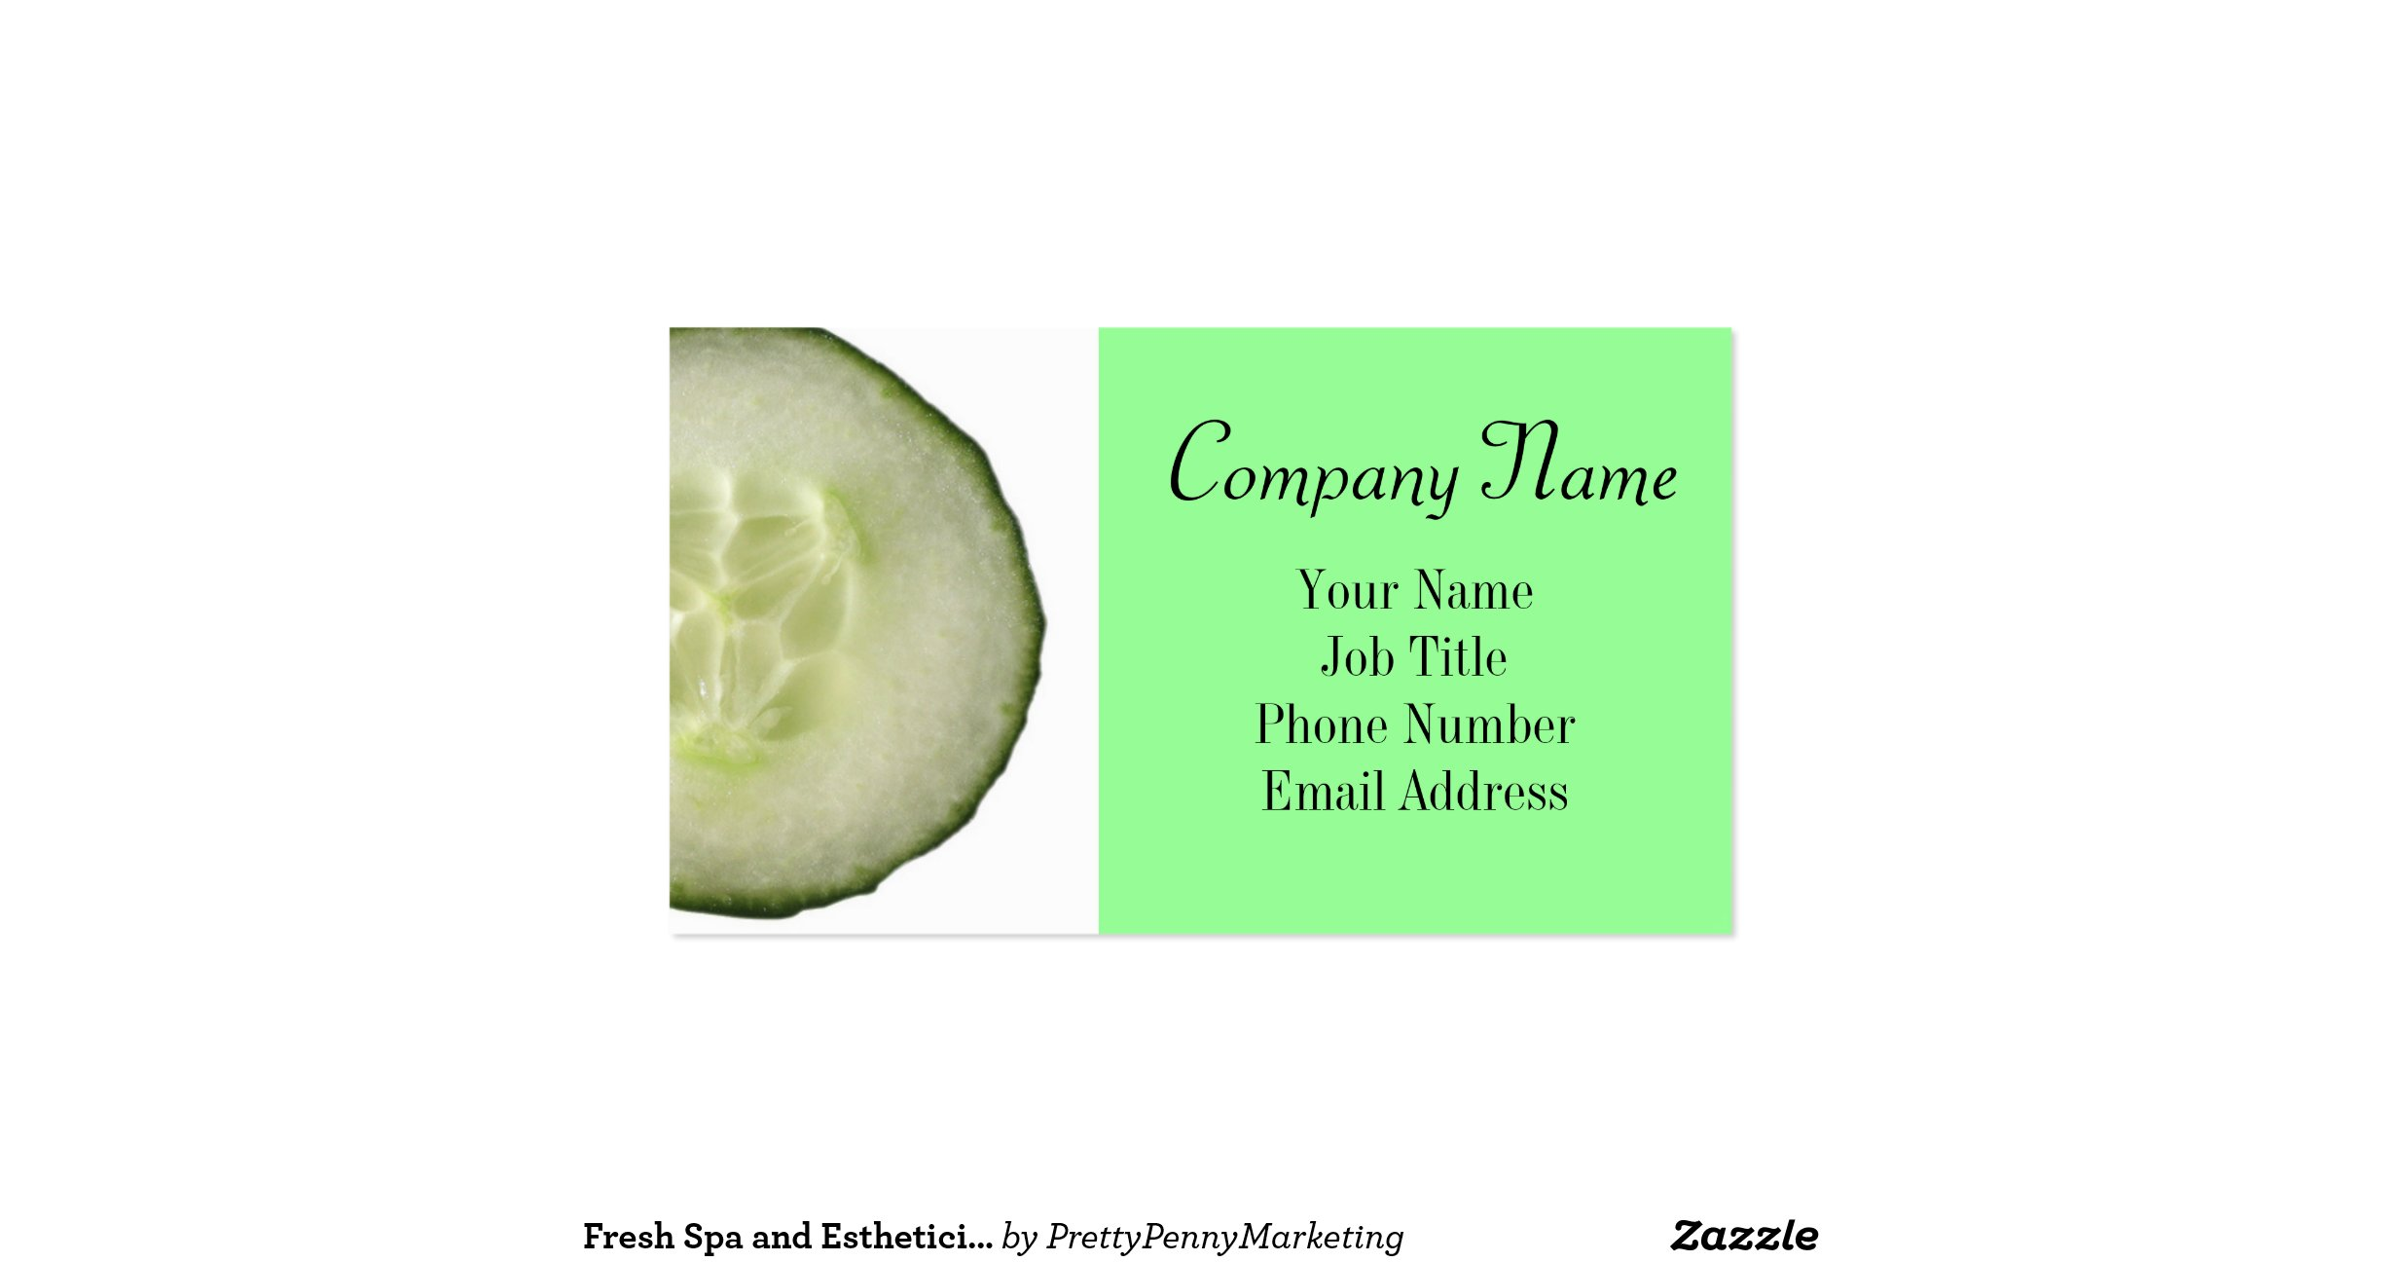 elegant photos of esthetician business card templates business cards and resume. Black Bedroom Furniture Sets. Home Design Ideas